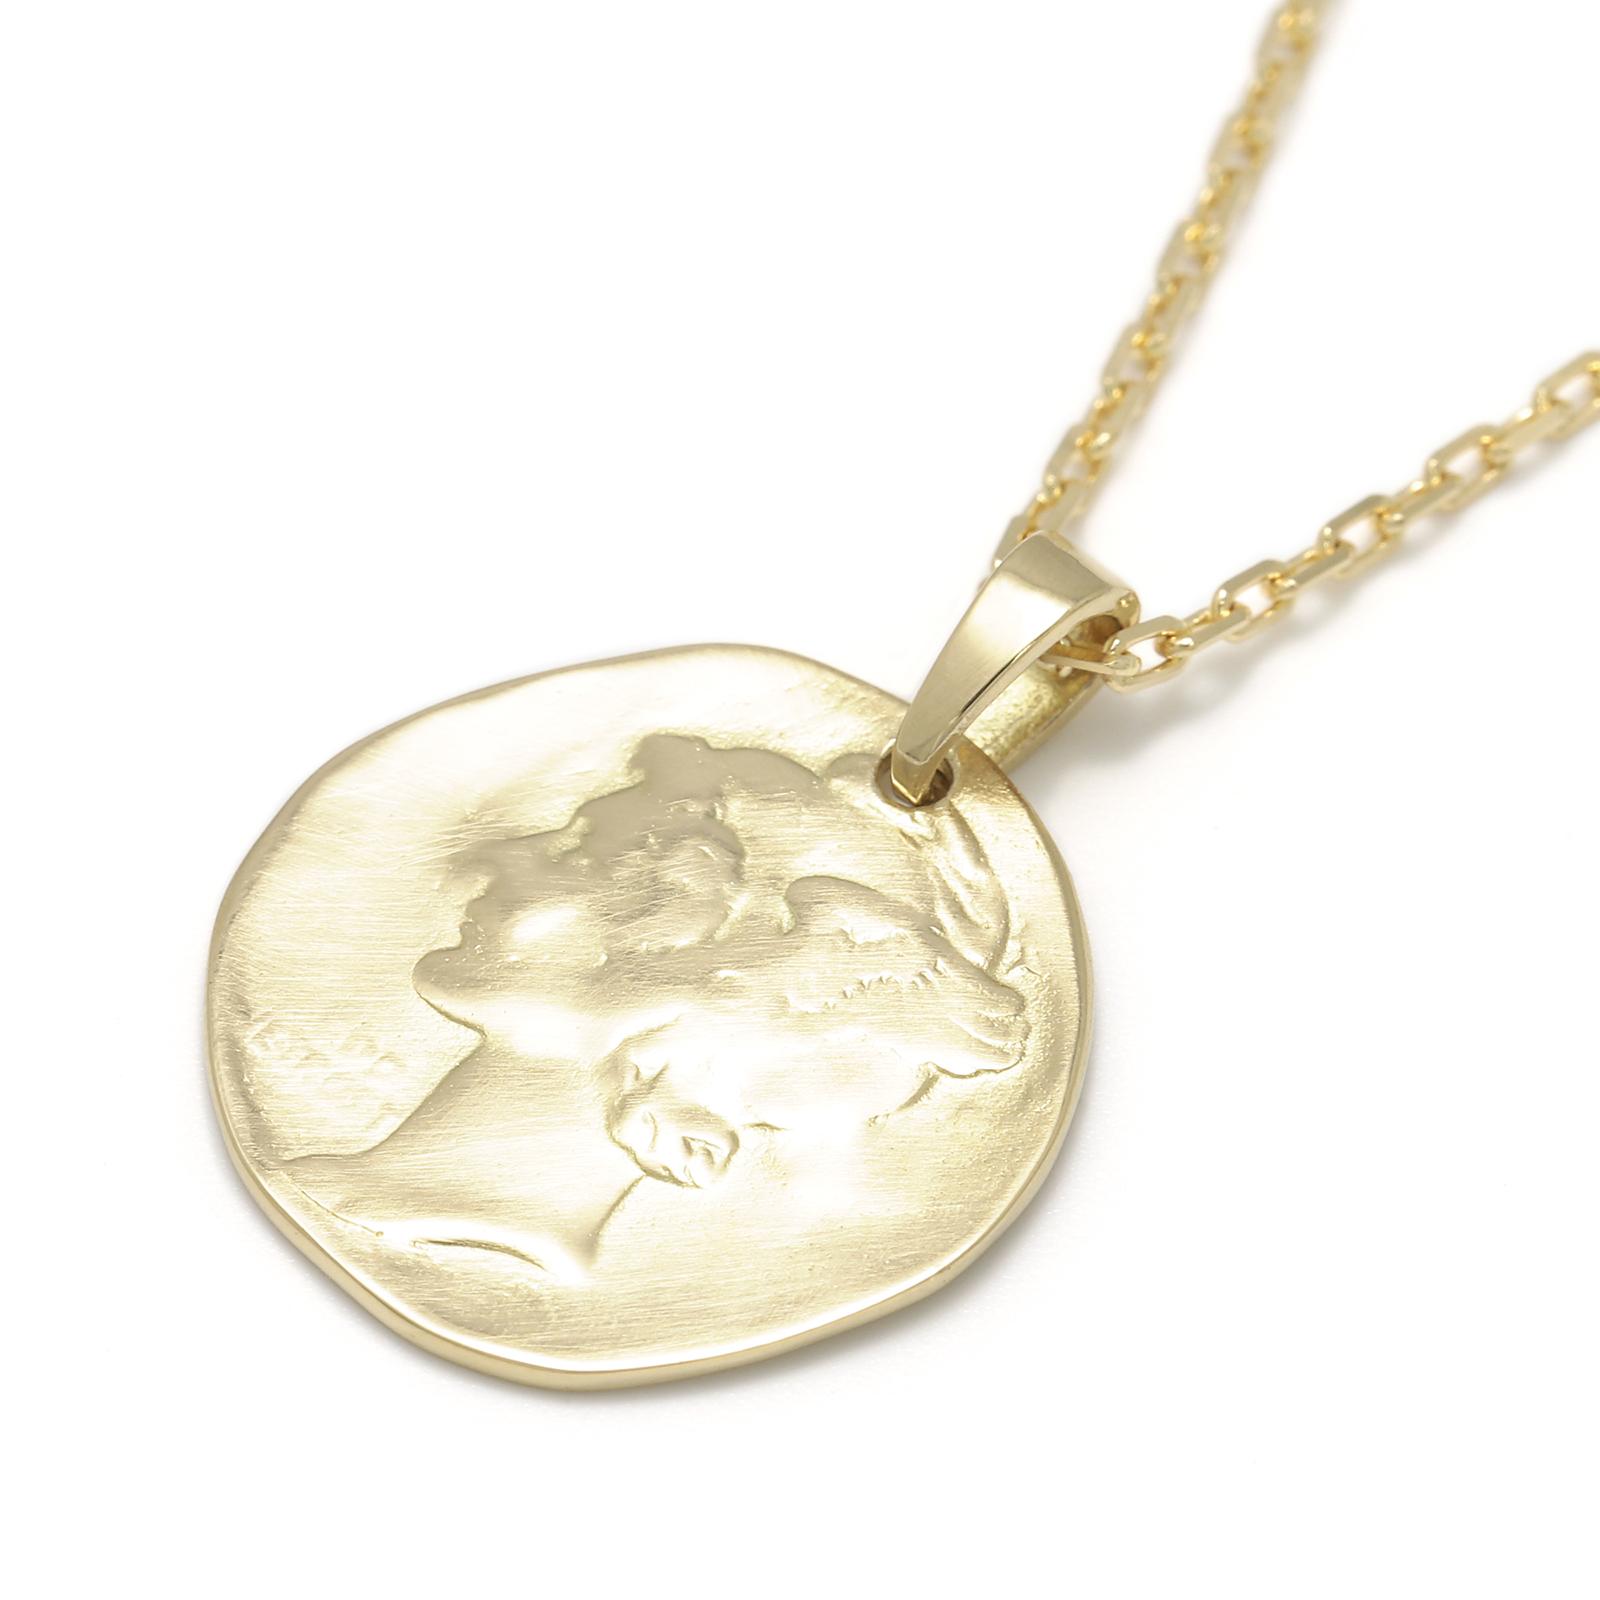 Liberty Head Pendant - K18Yellow Gold